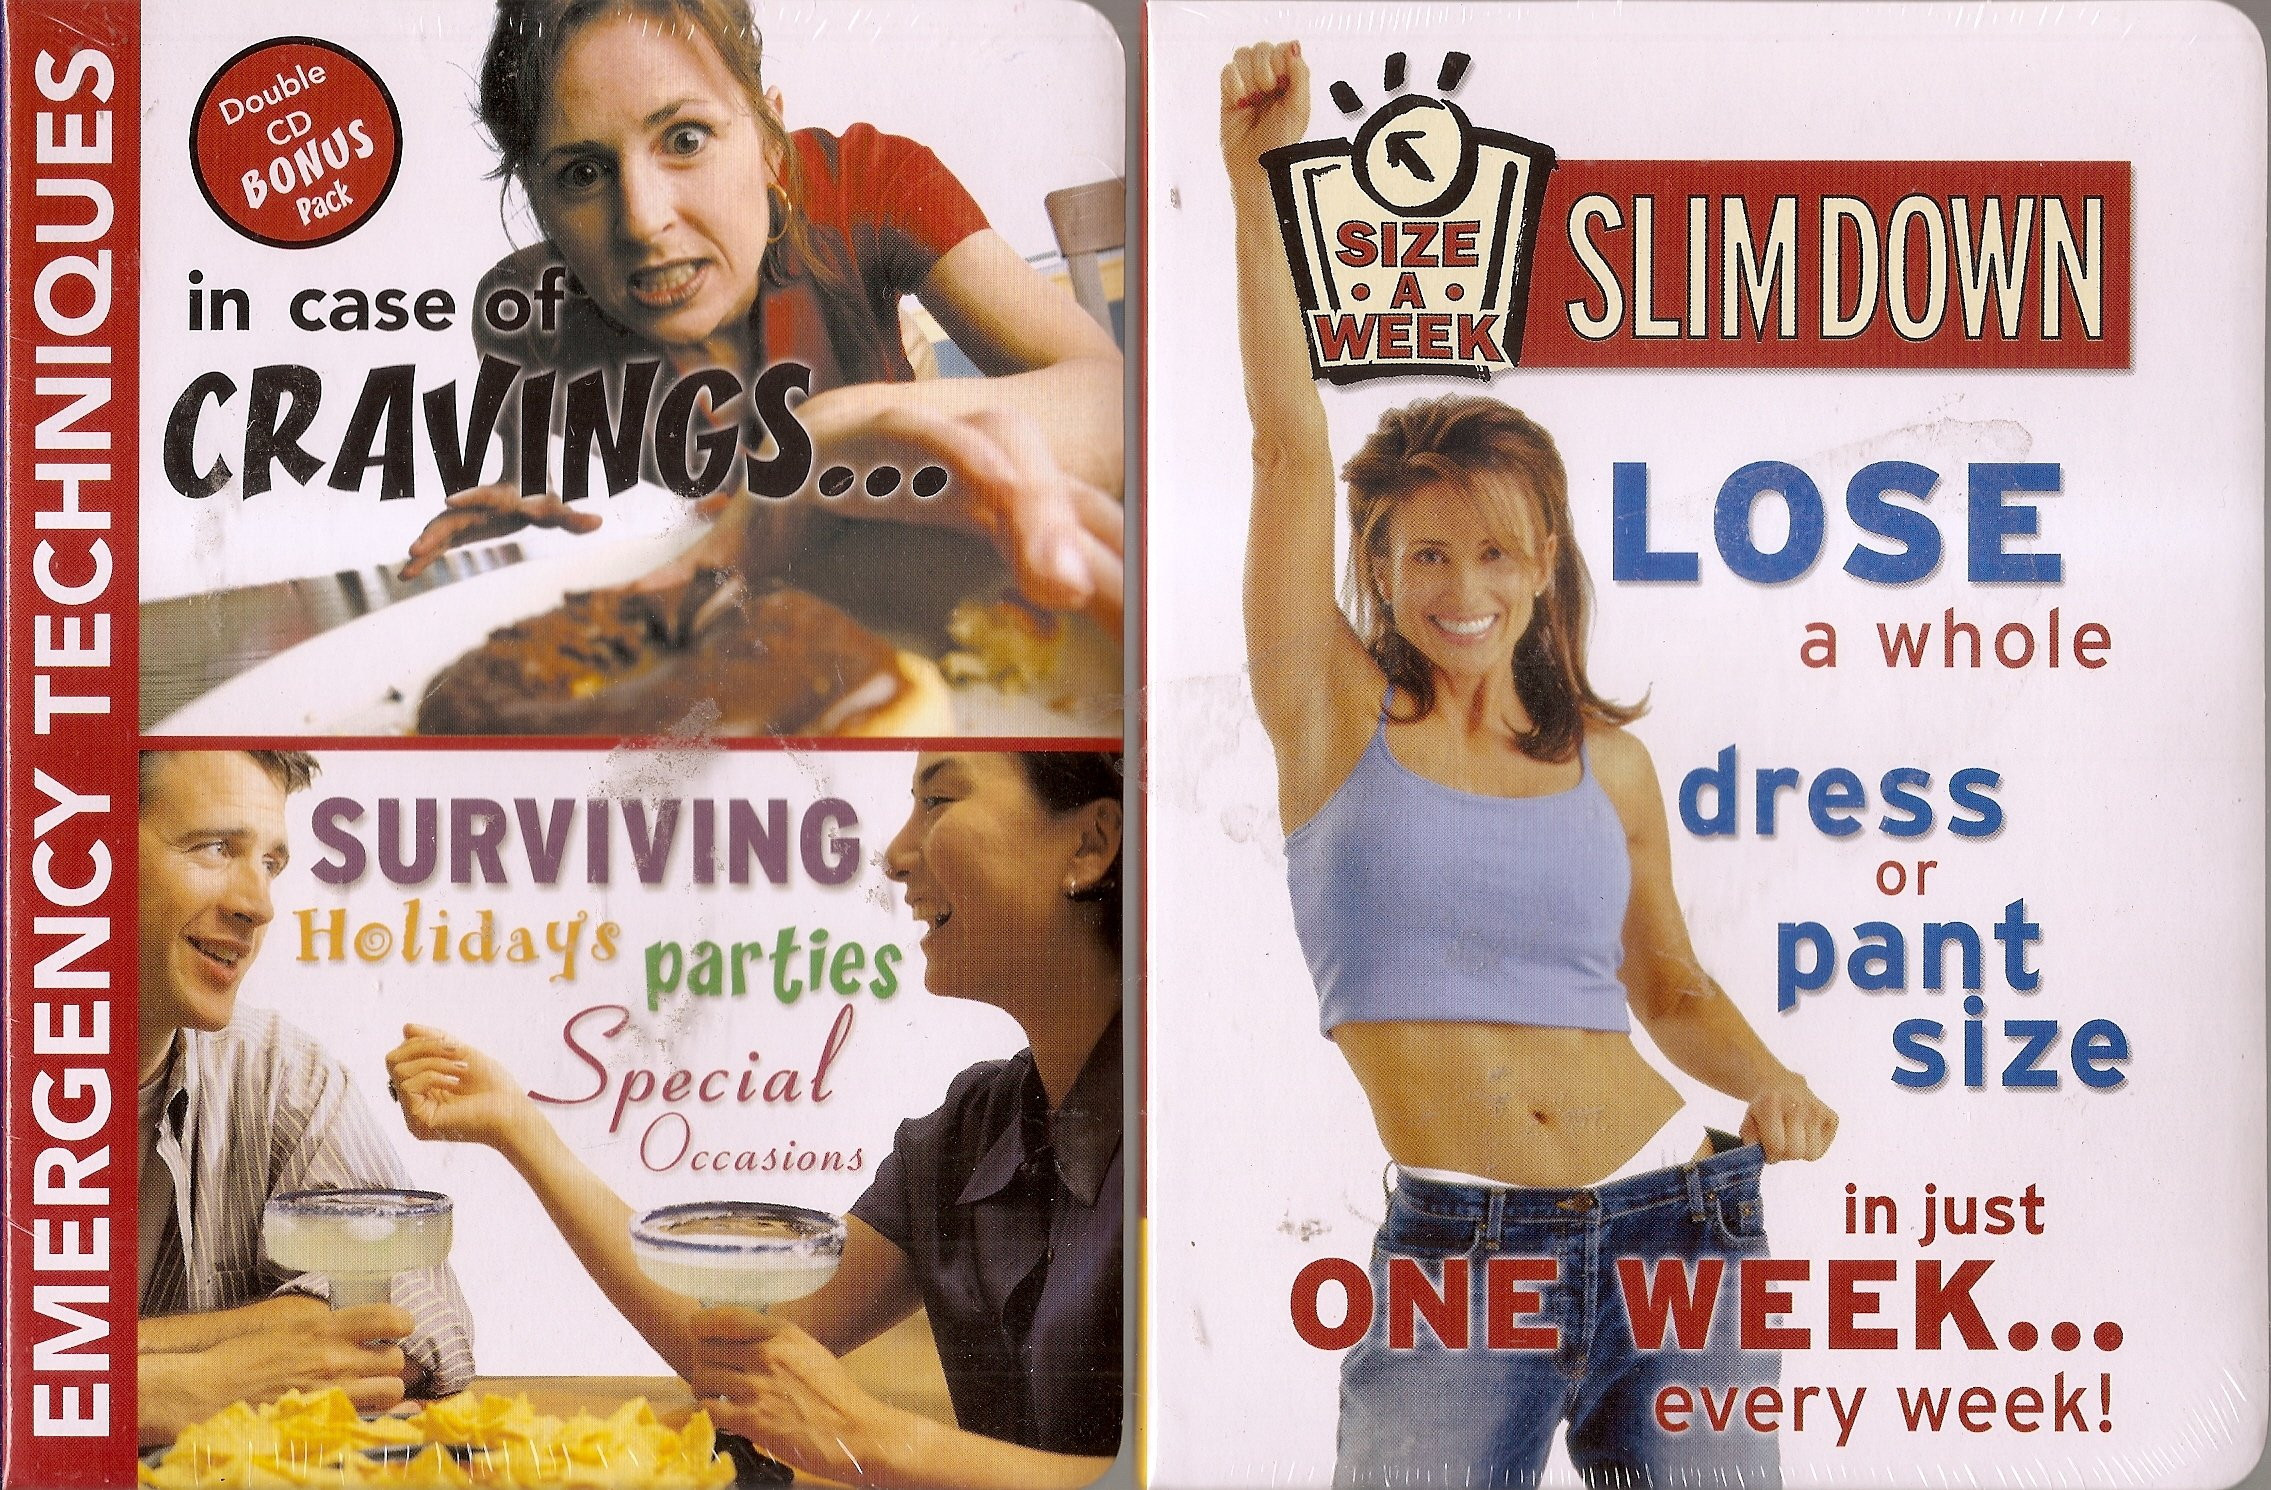 Best birth control lose weight